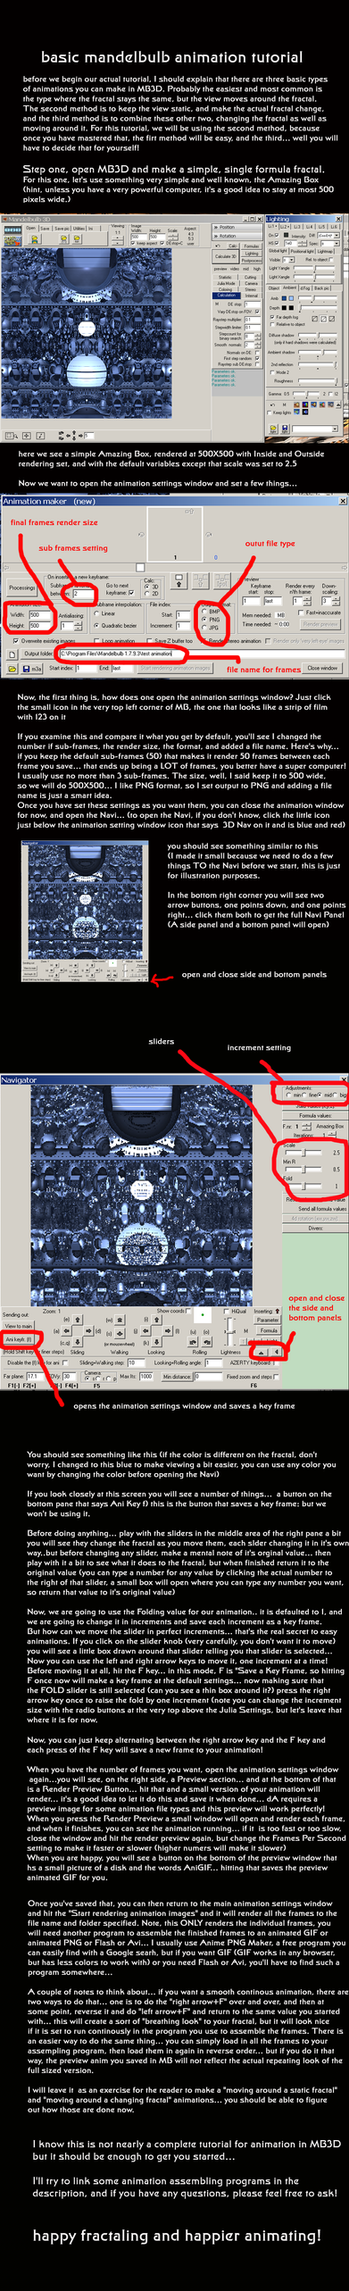 basic Mandelbulb Animation Tutorial by fraterchaos